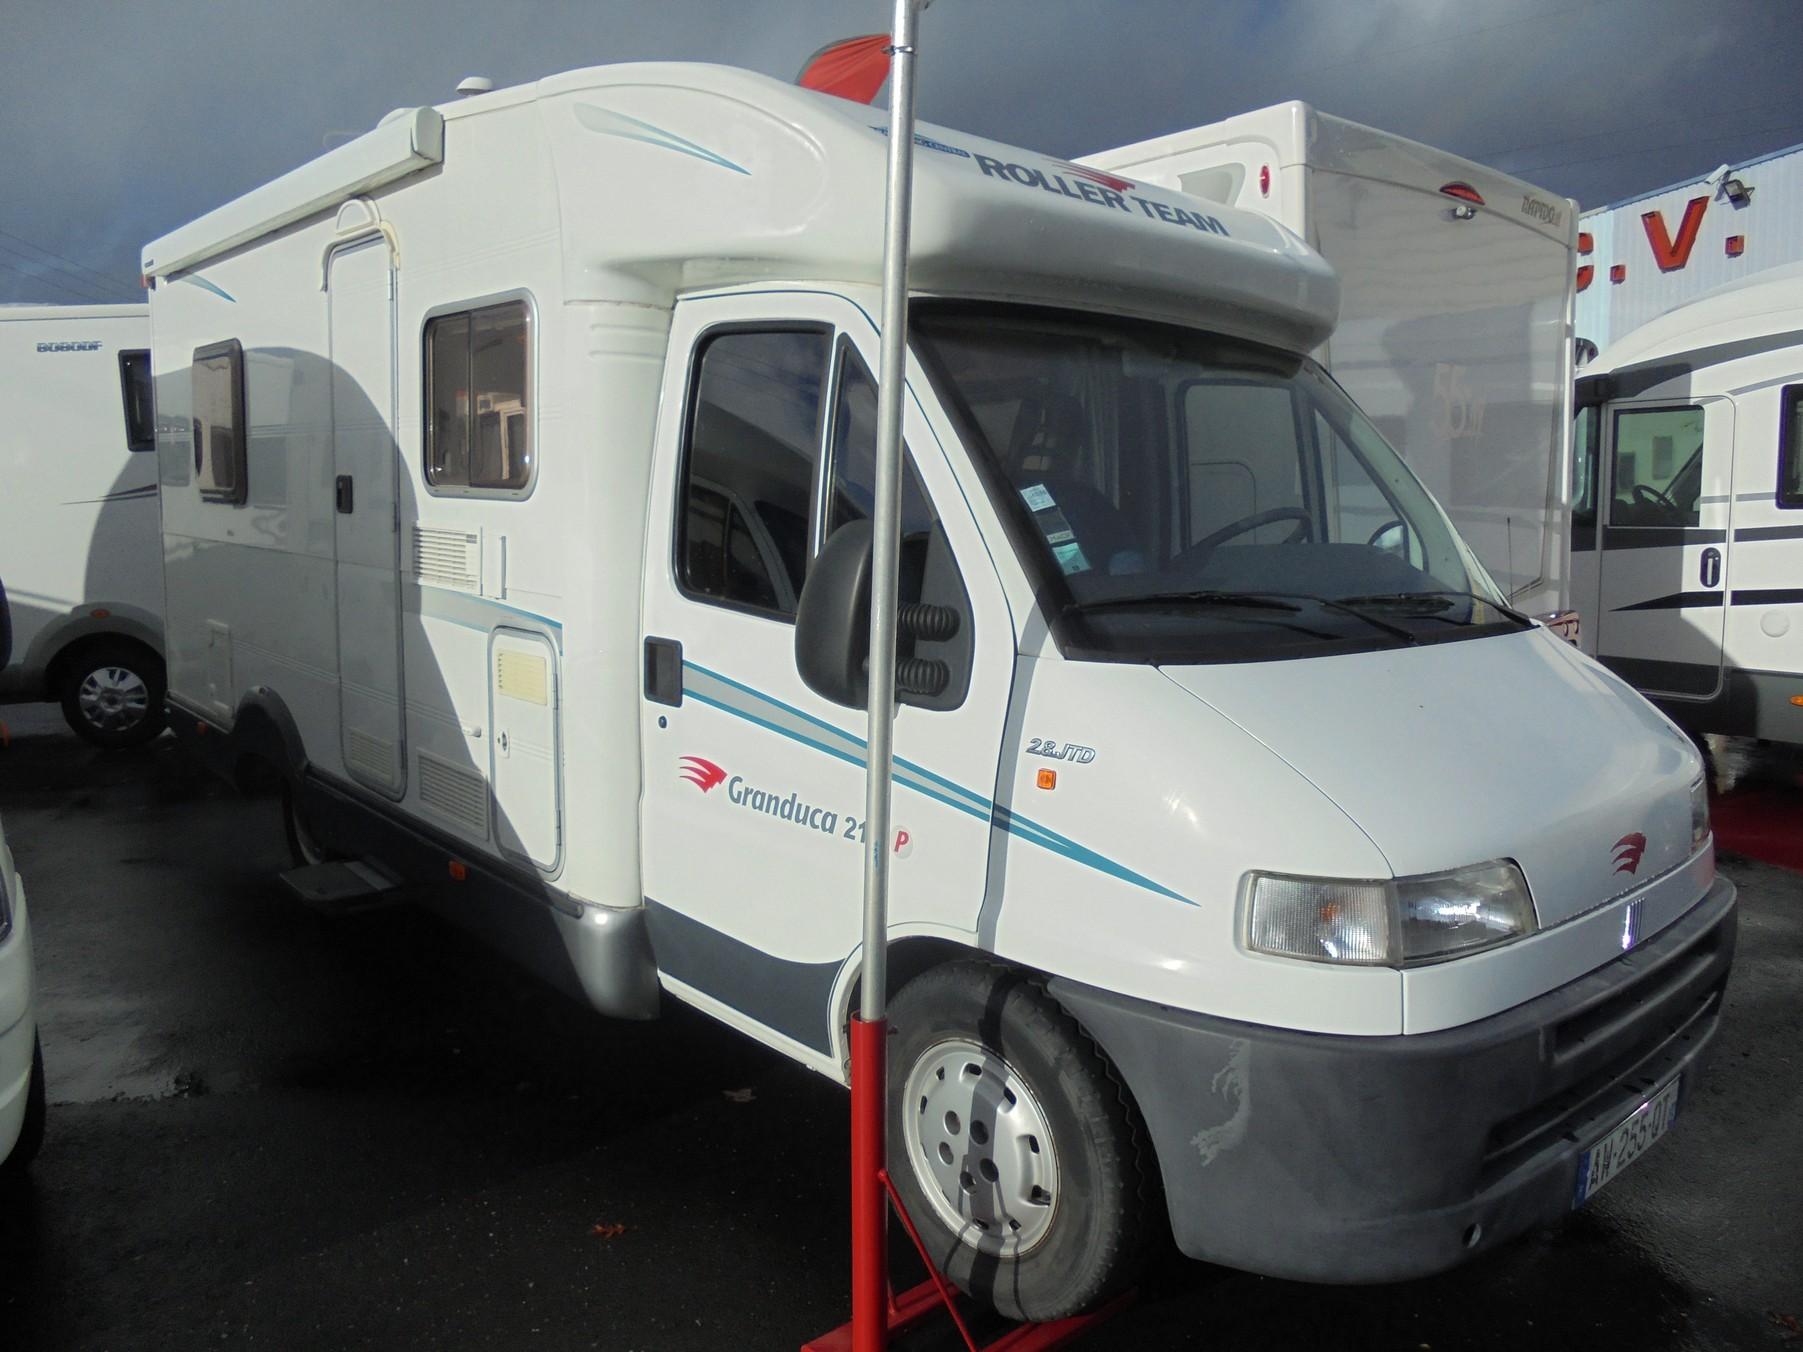 roller team granduca 215 p occasion de 2002 fiat camping car en vente treillieres loire. Black Bedroom Furniture Sets. Home Design Ideas